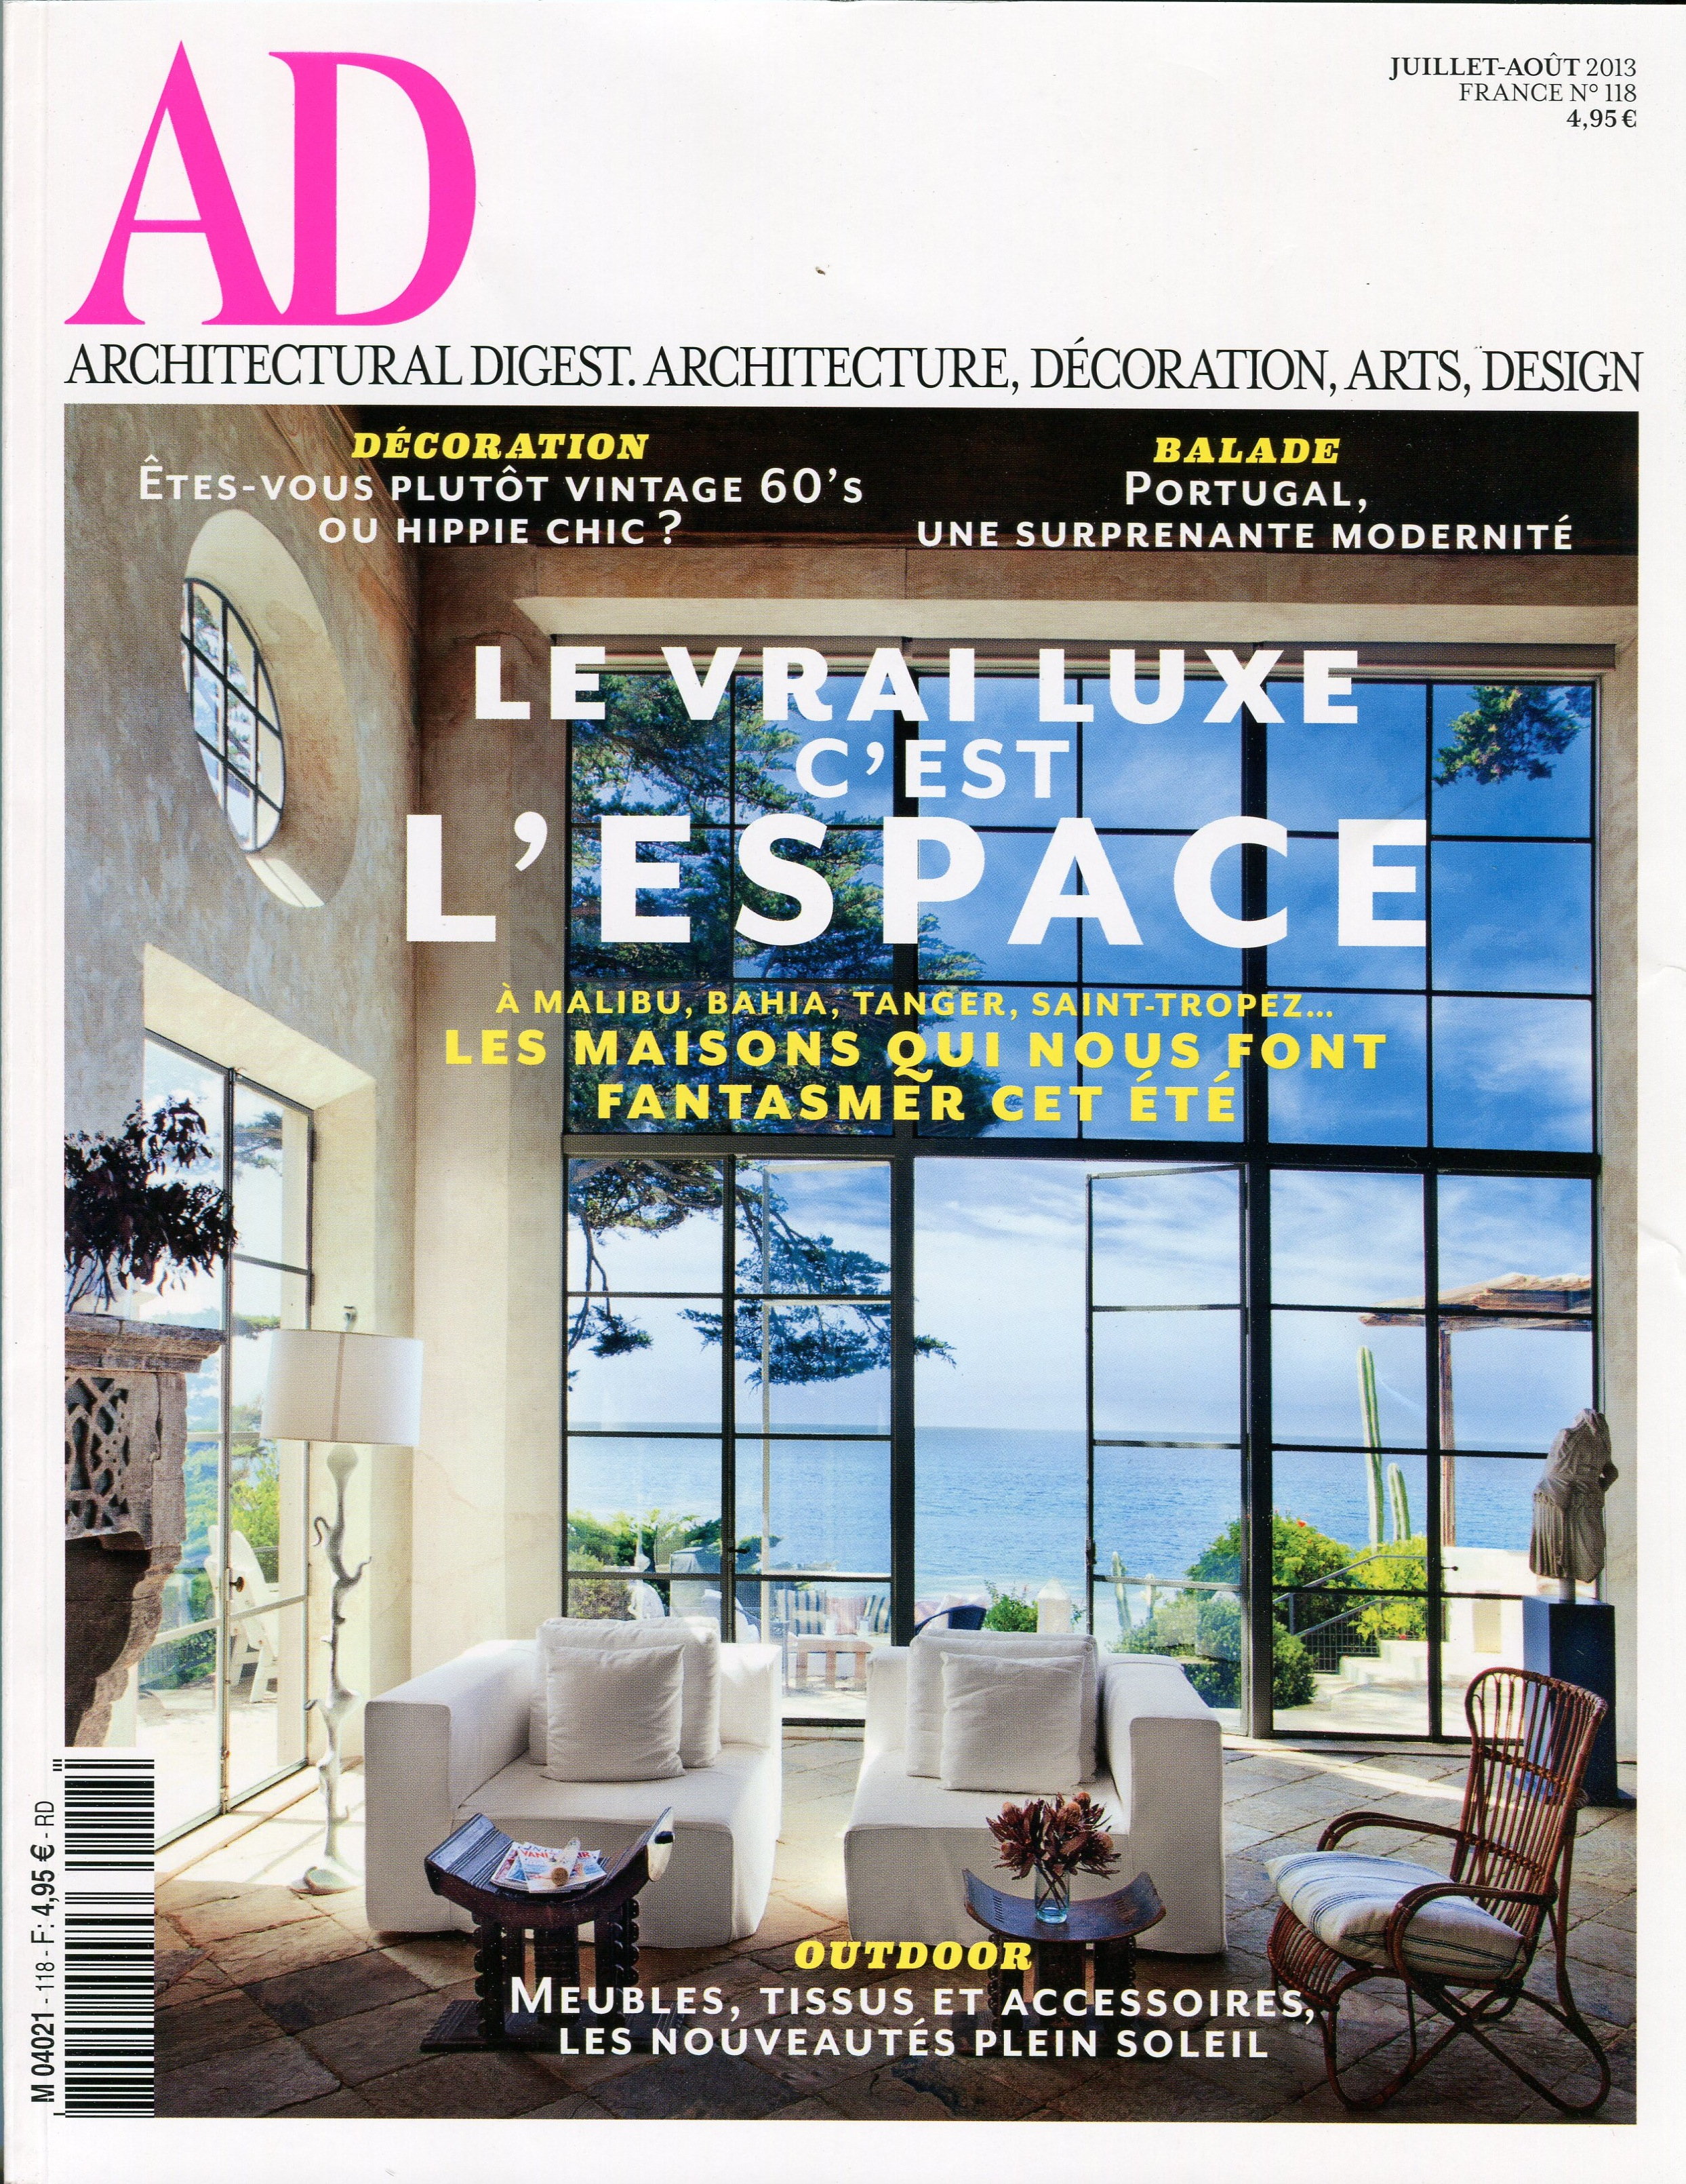 Architectural Digest France July 2013. ad france july 2013_1 ...